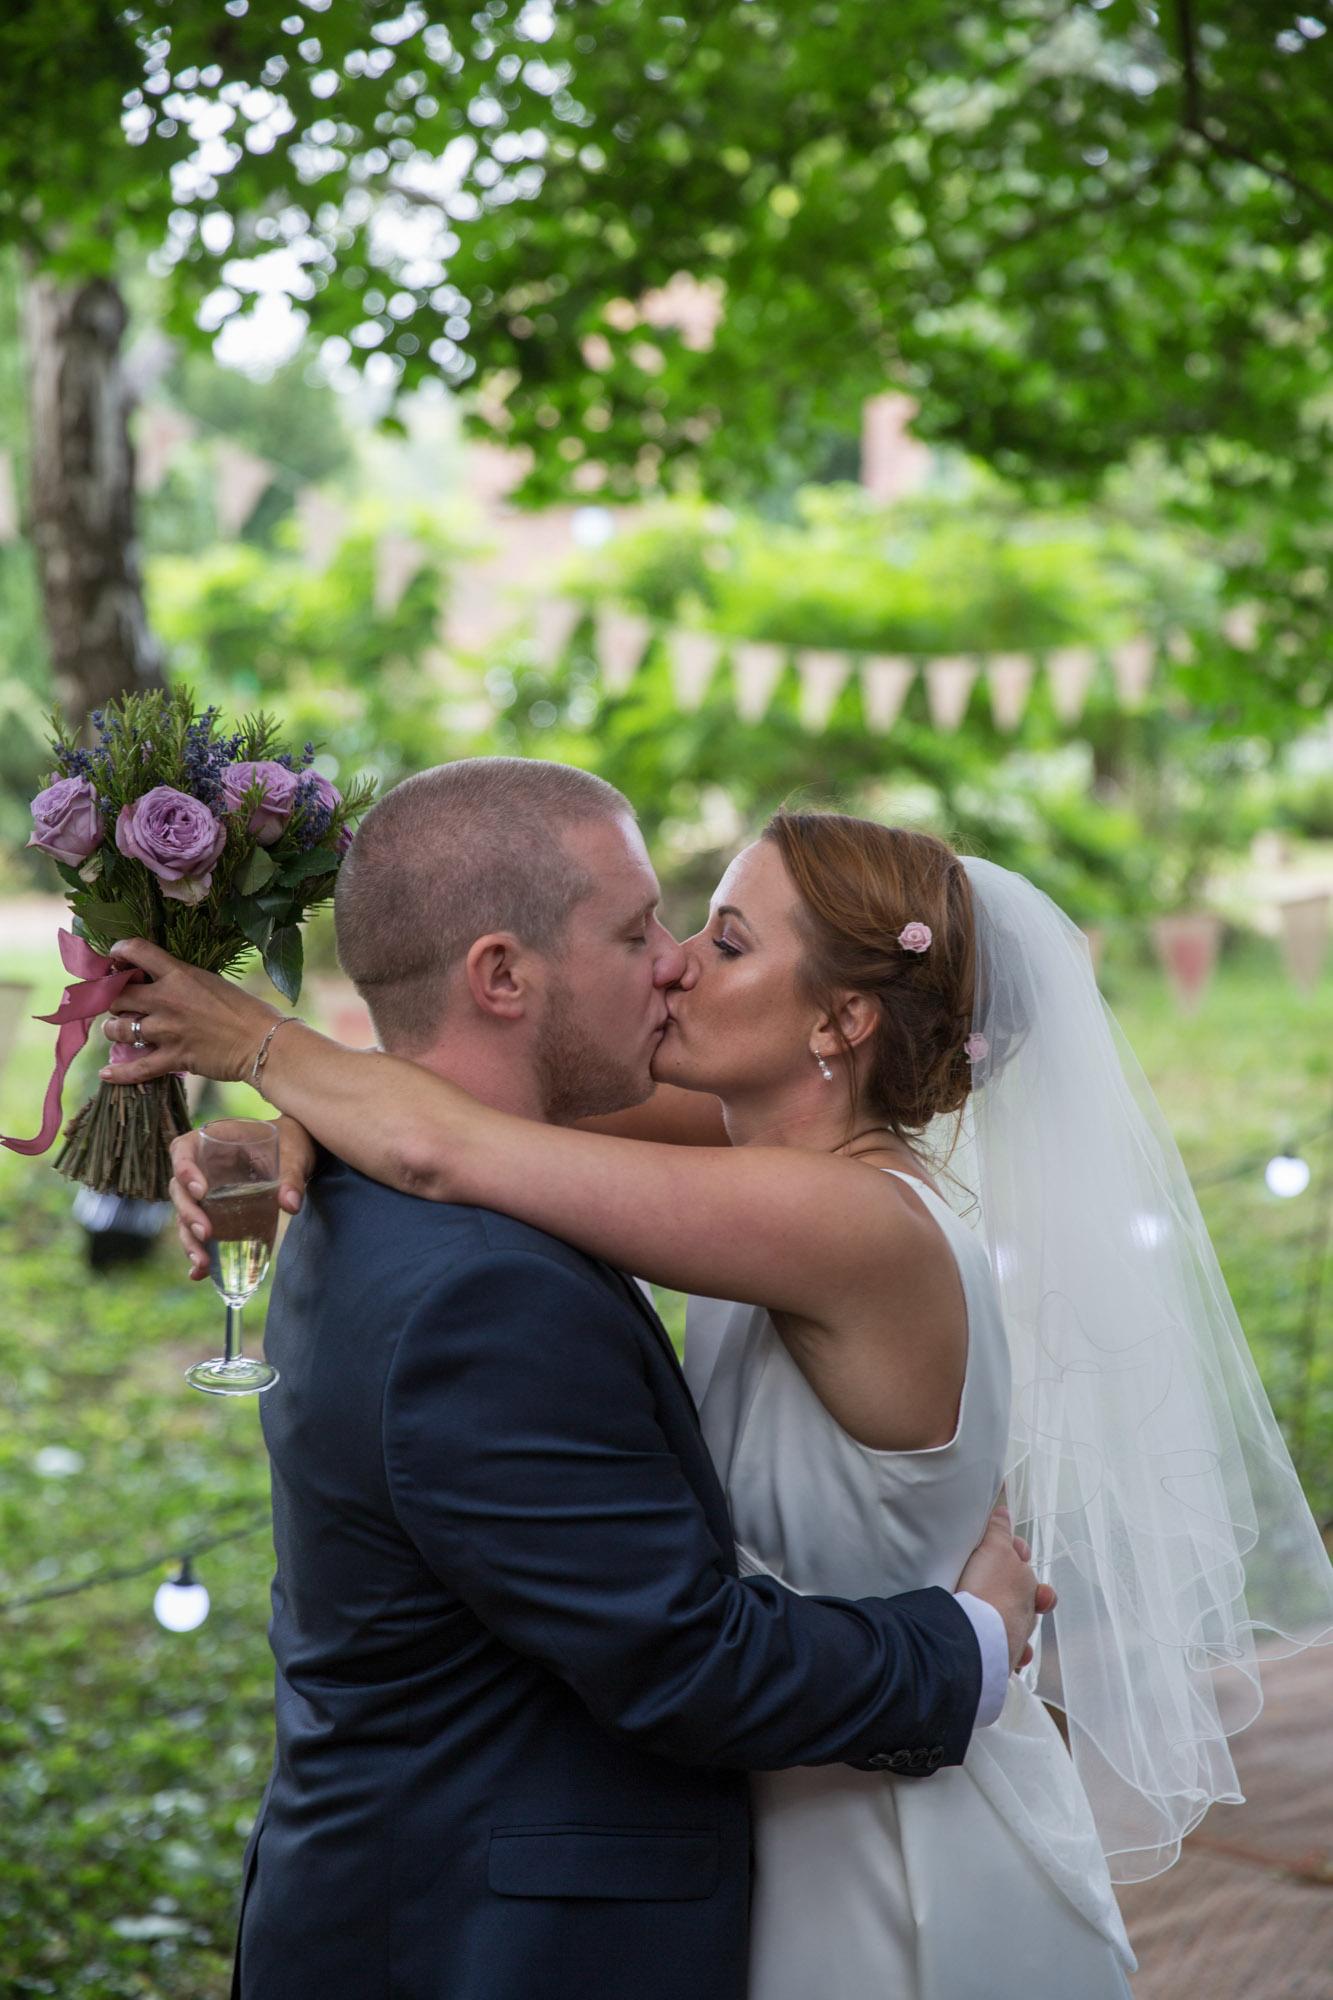 weddings-couples-love-photographer-oxford-london-jonathan-self-photography-93.jpg